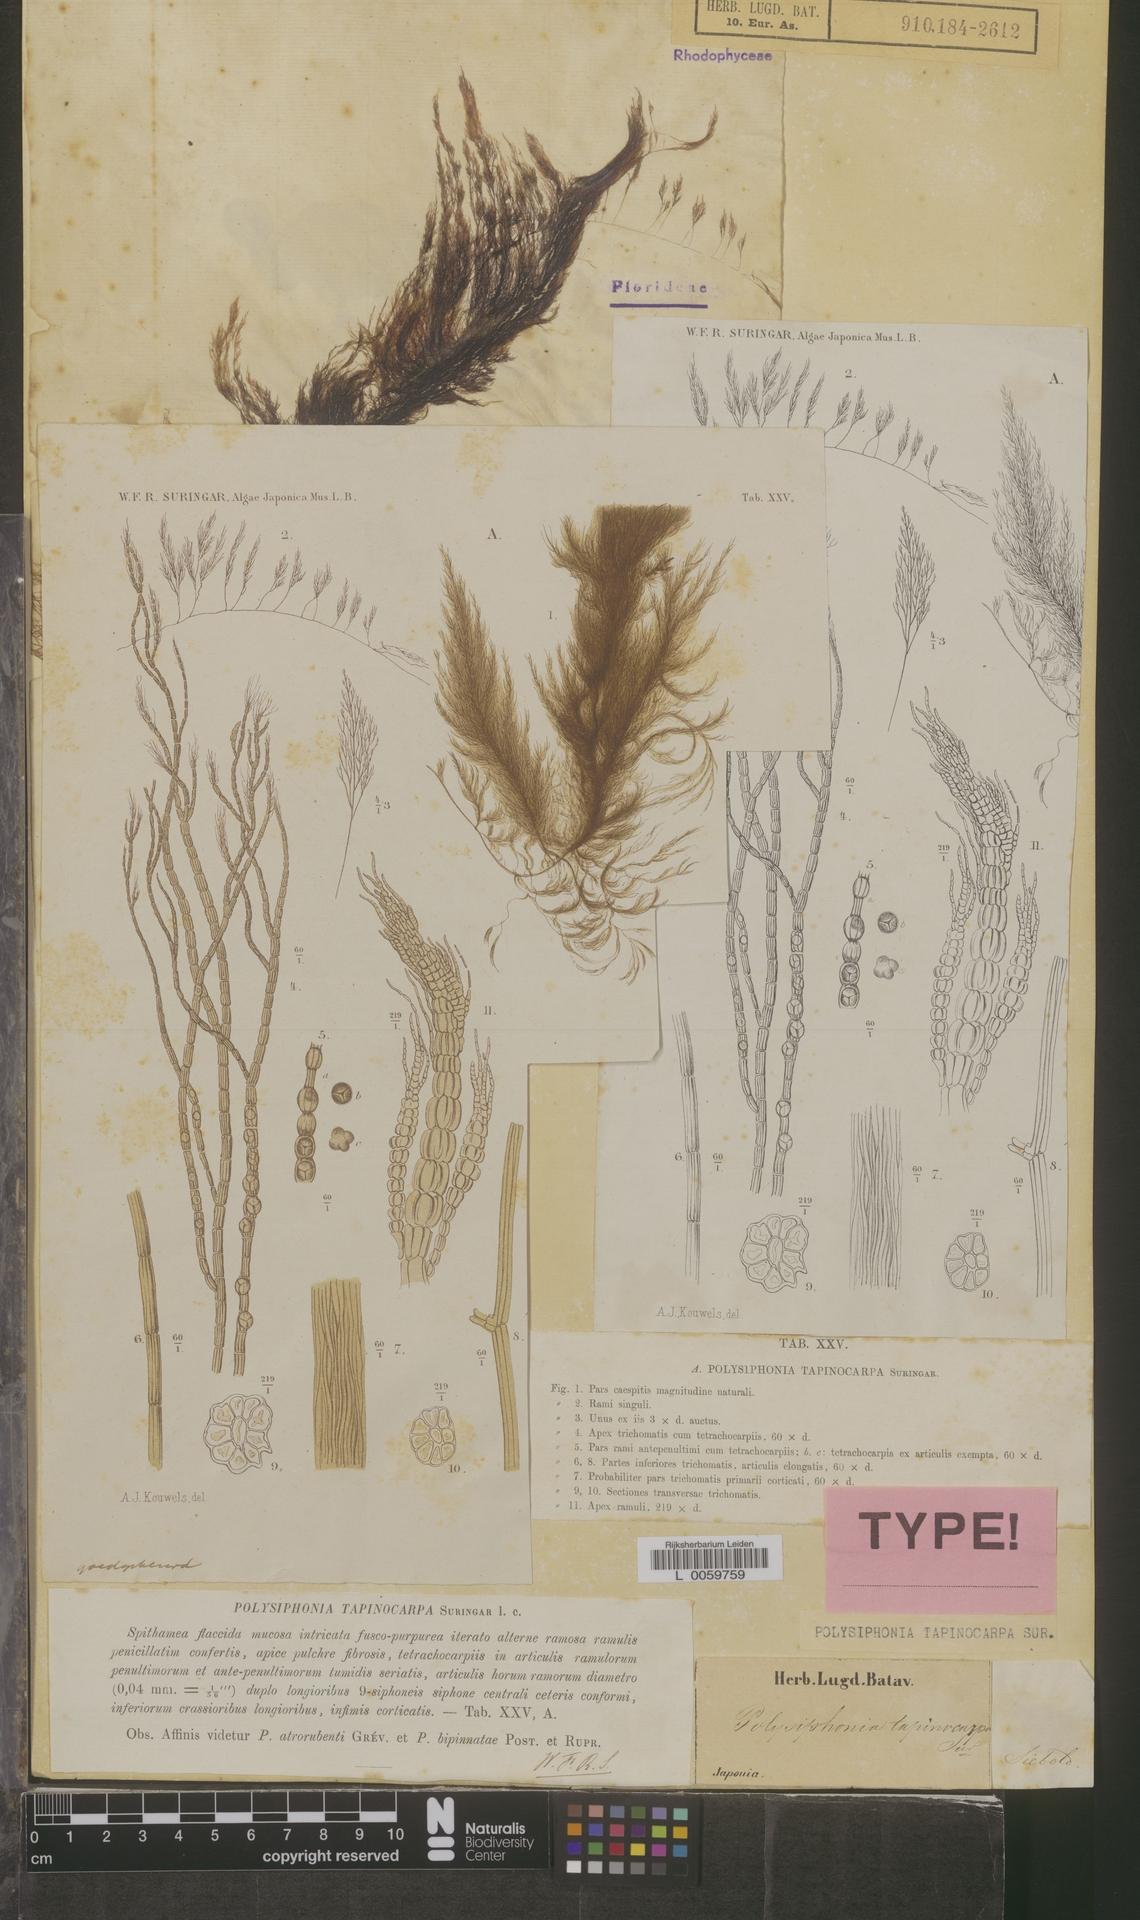 L  0059759 | Polysiphonia tapinocarpa Suringar